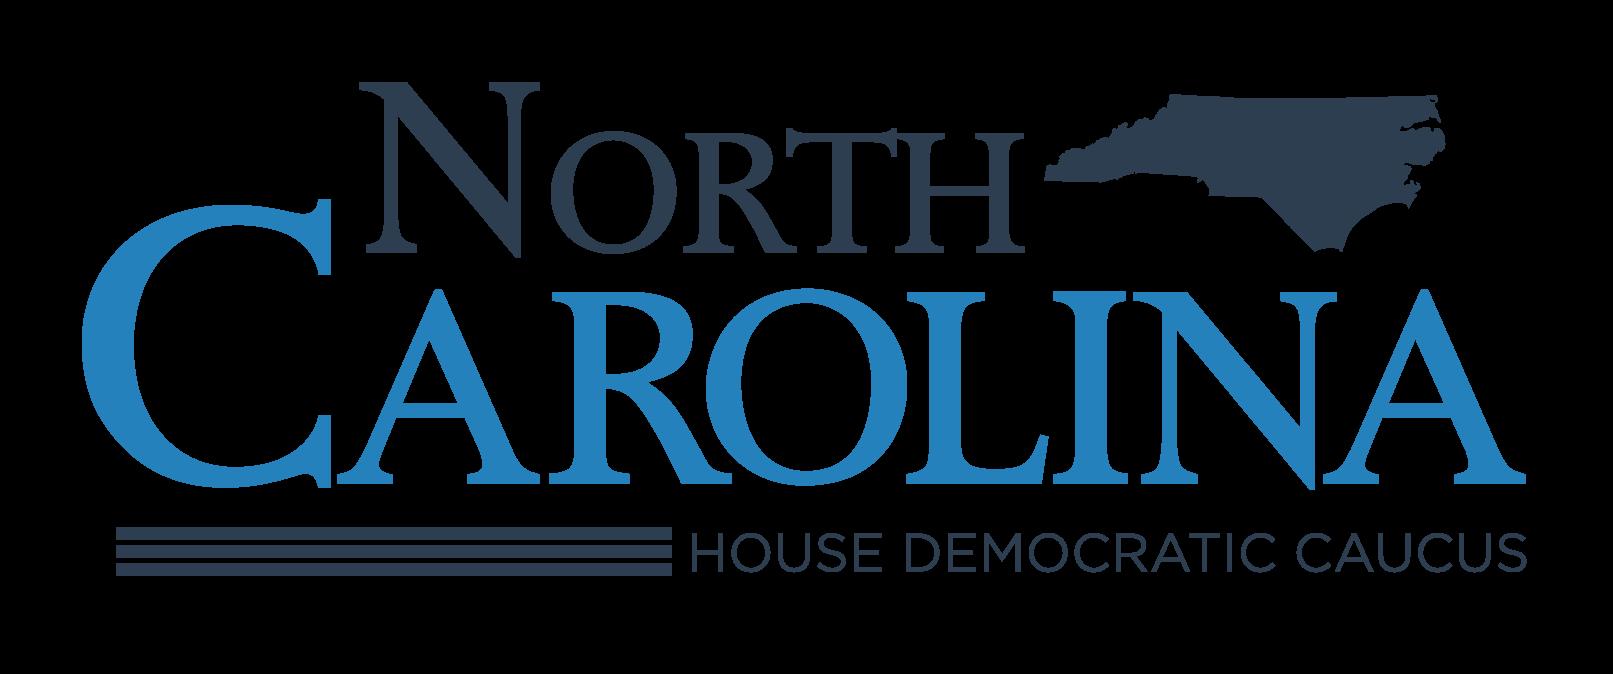 North Carolina Democratic Party - House Caucus